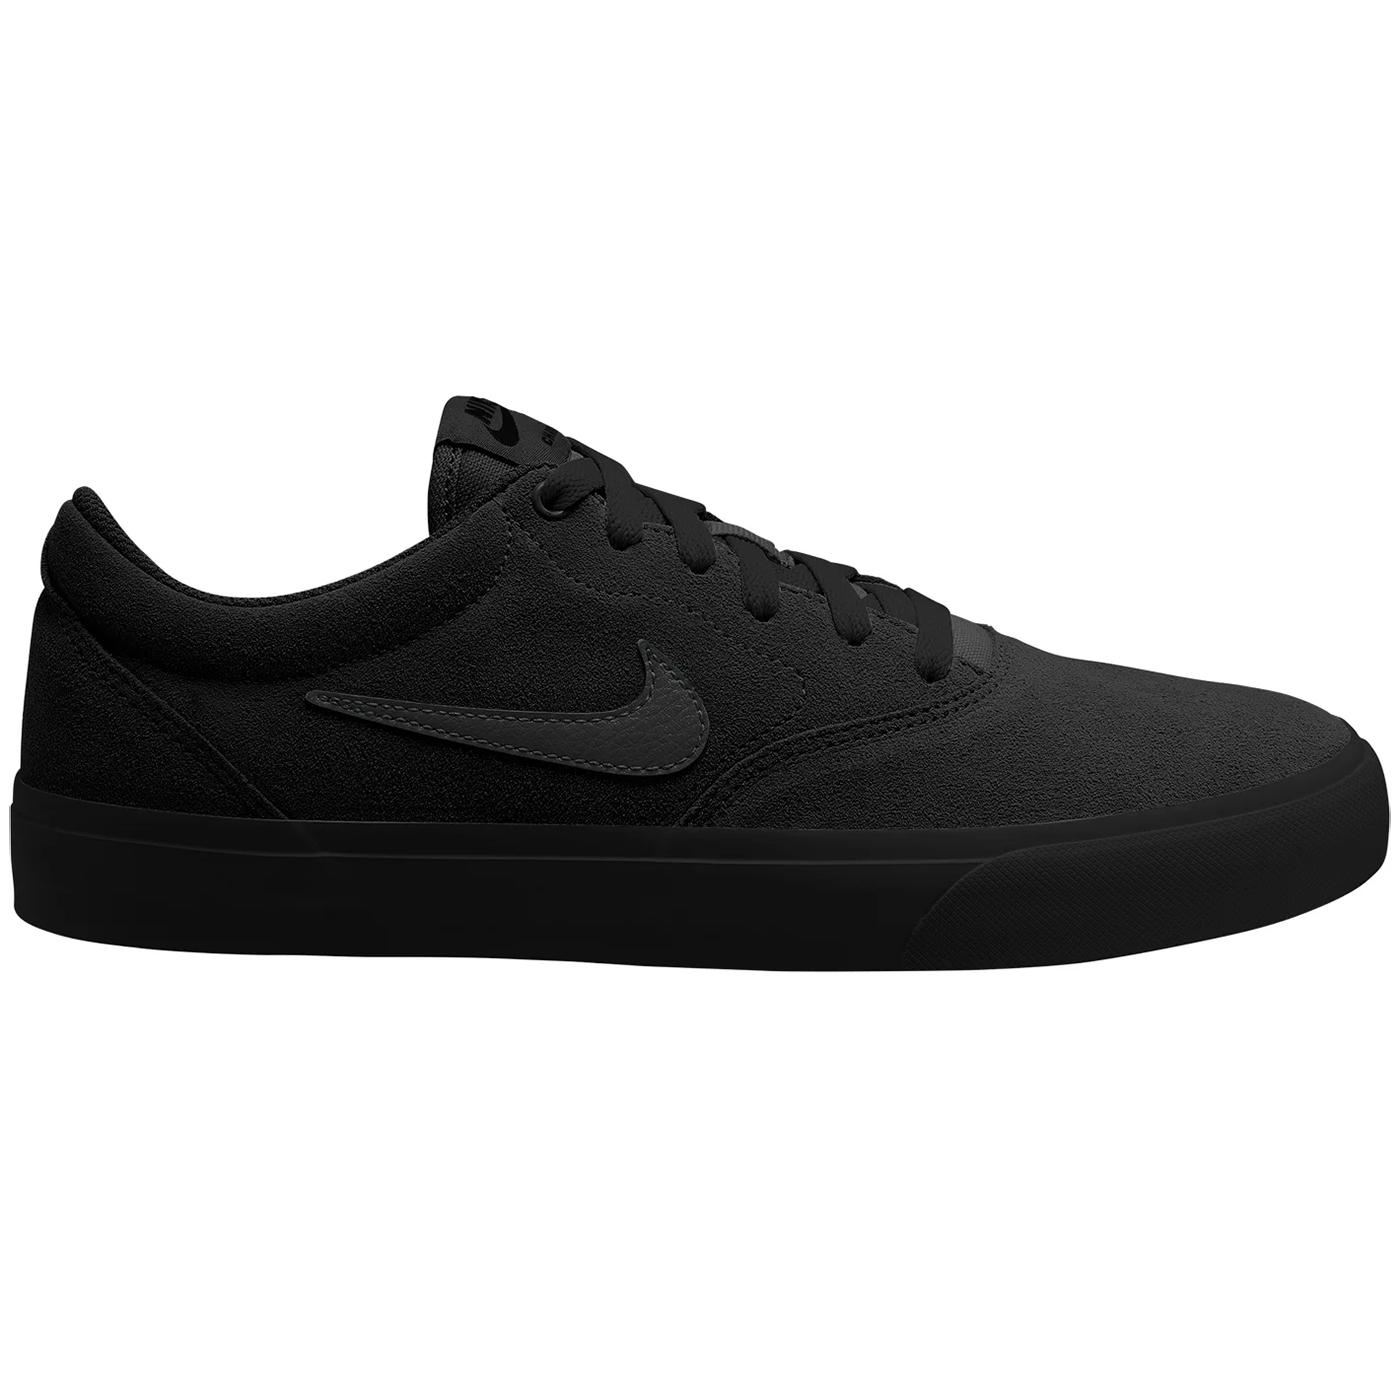 Nike SB Charge Suede Sneaker Skateschuh schwarz